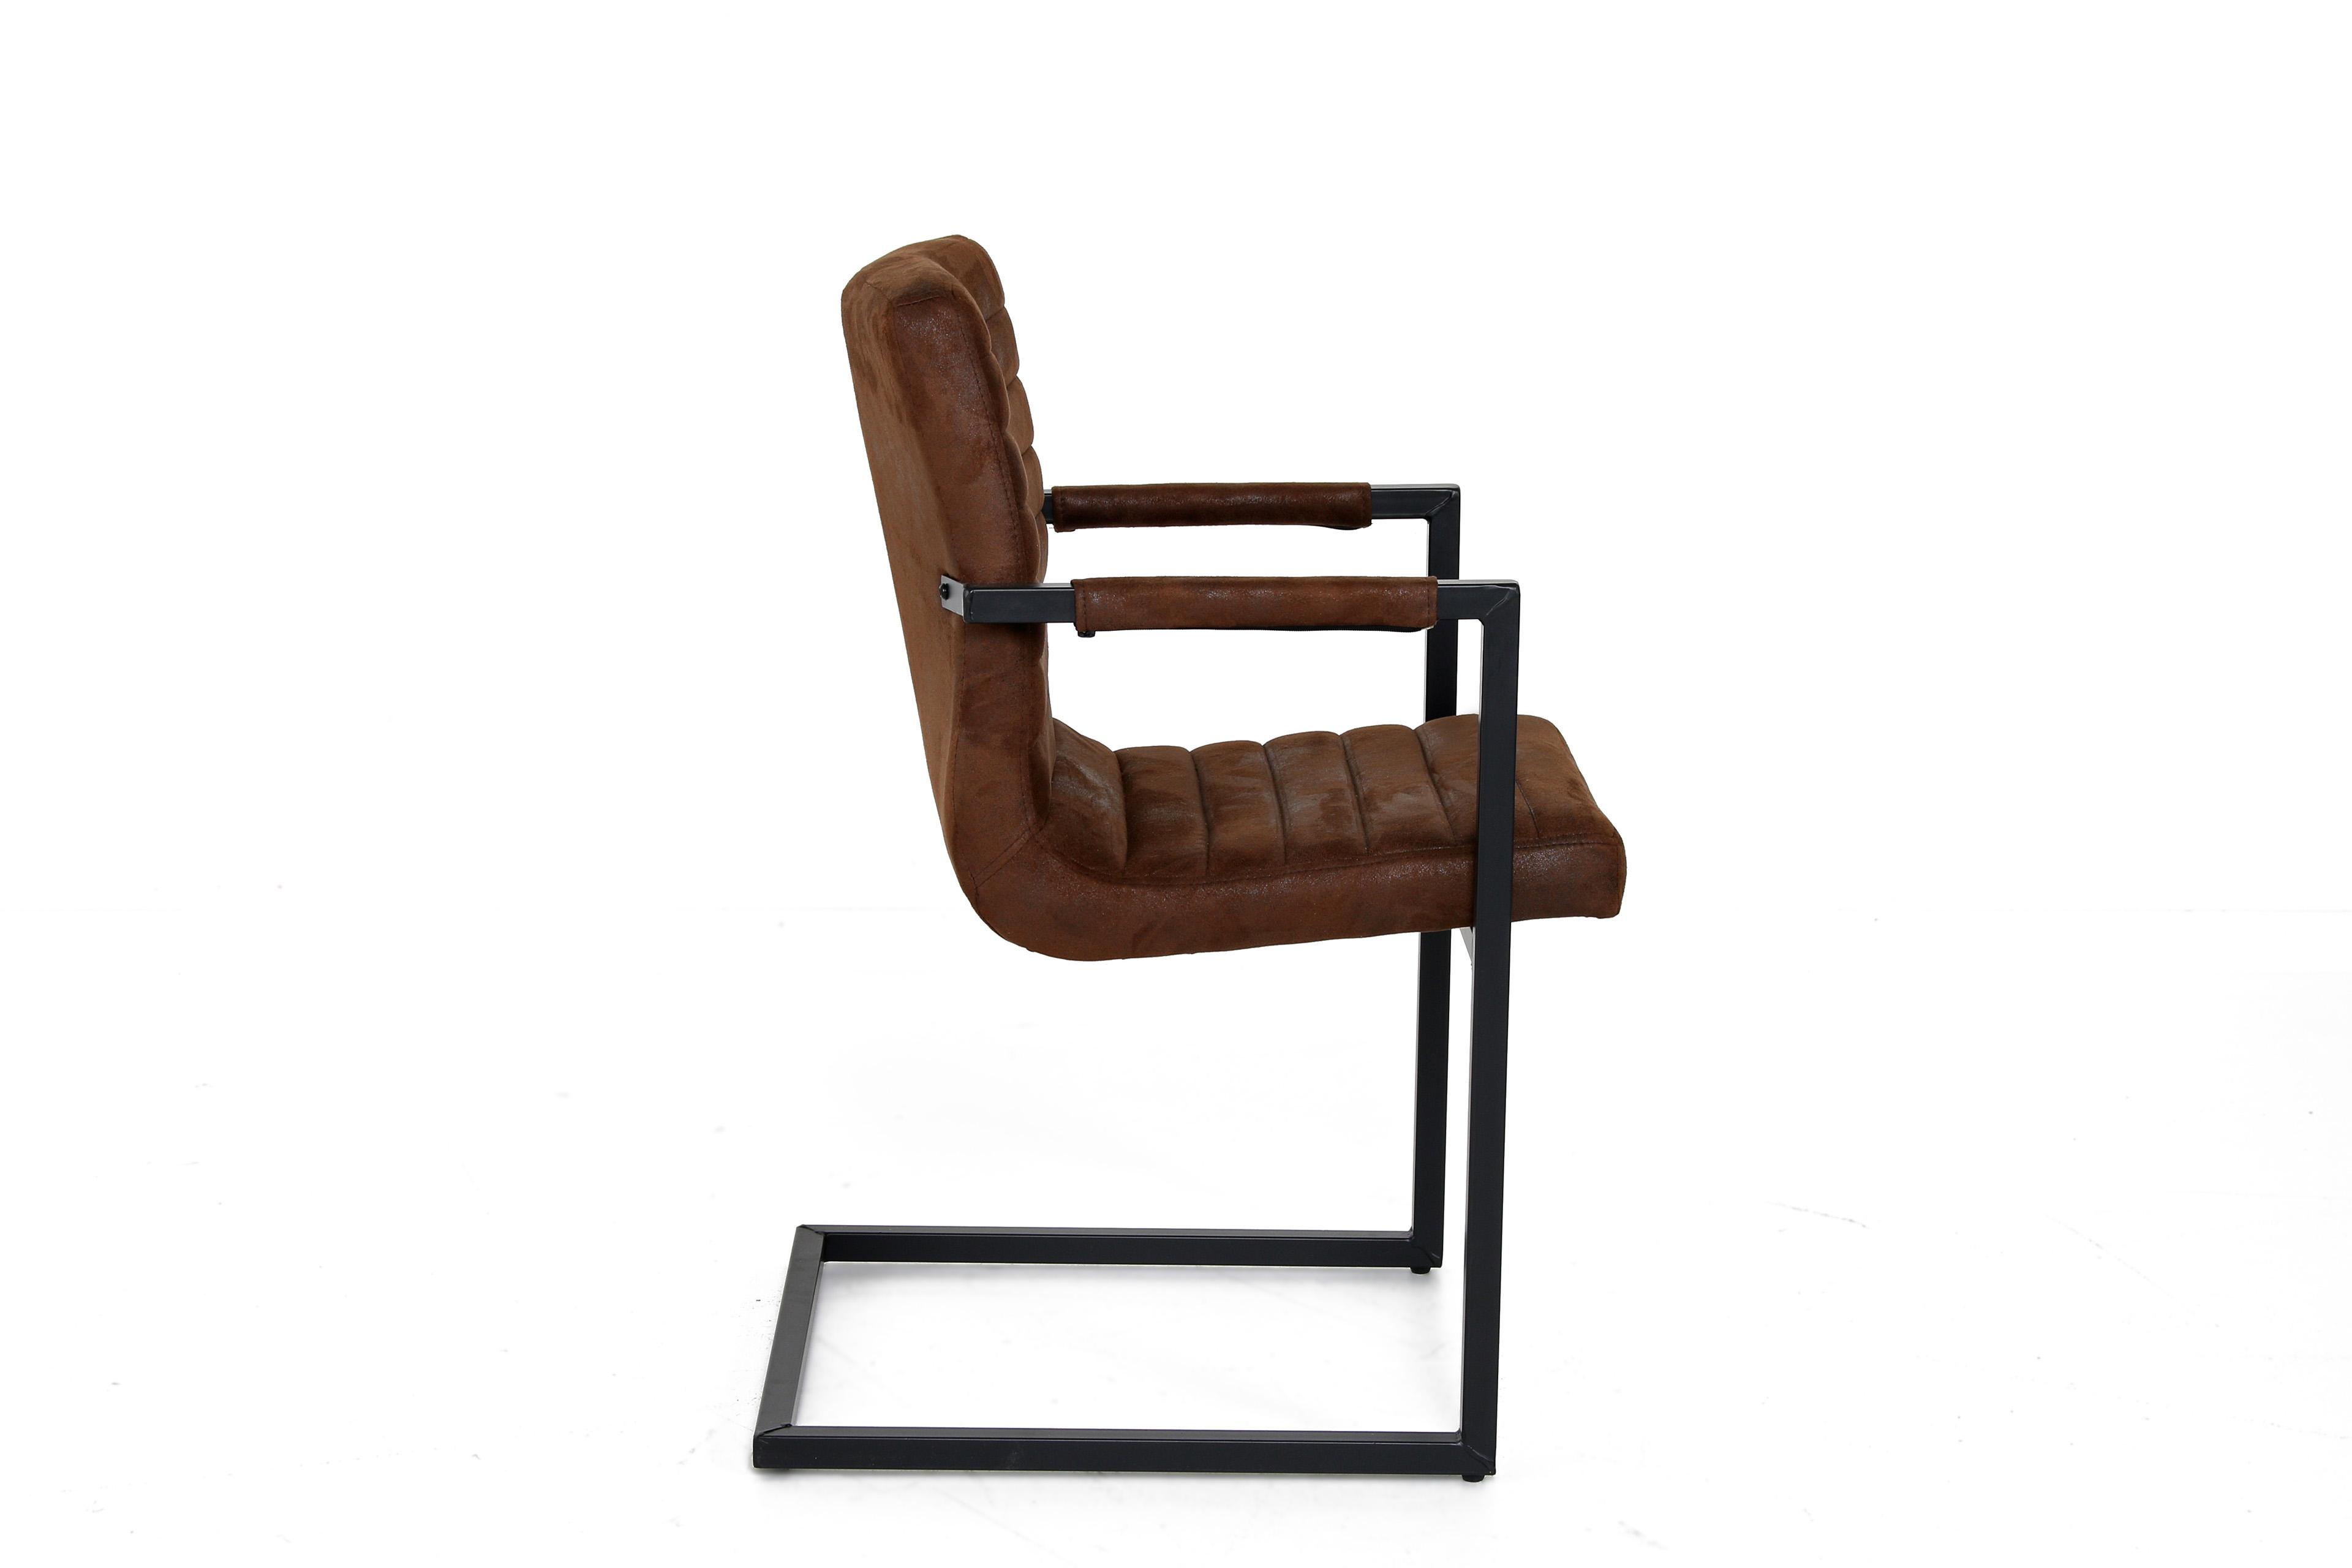 stuhl parzival braun antik m bel letz ihr online shop. Black Bedroom Furniture Sets. Home Design Ideas